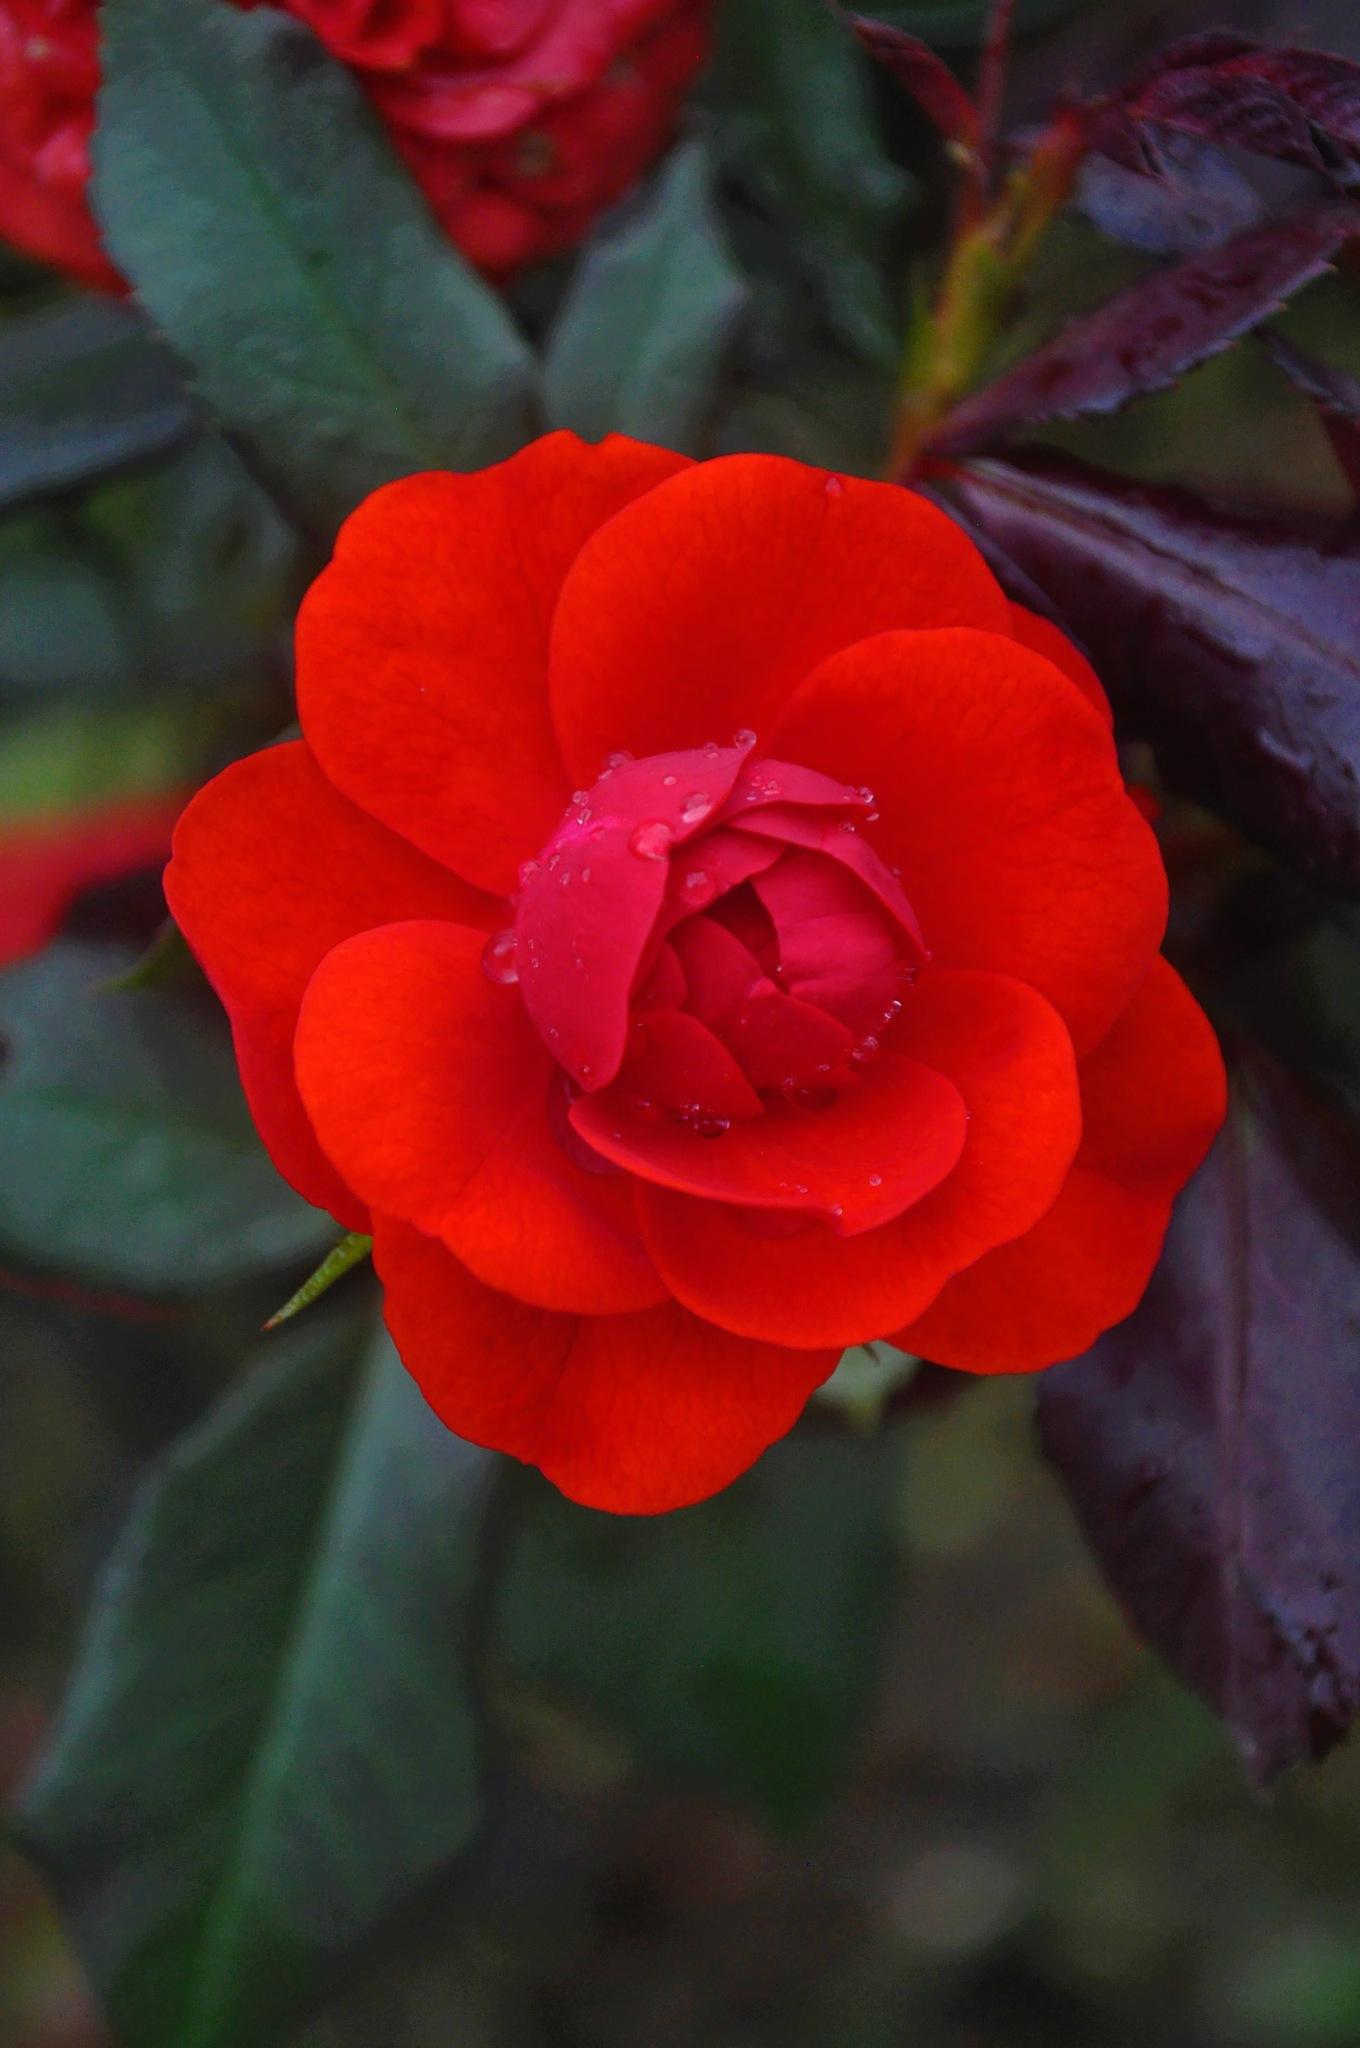 Red Rose by Kishore Shetty